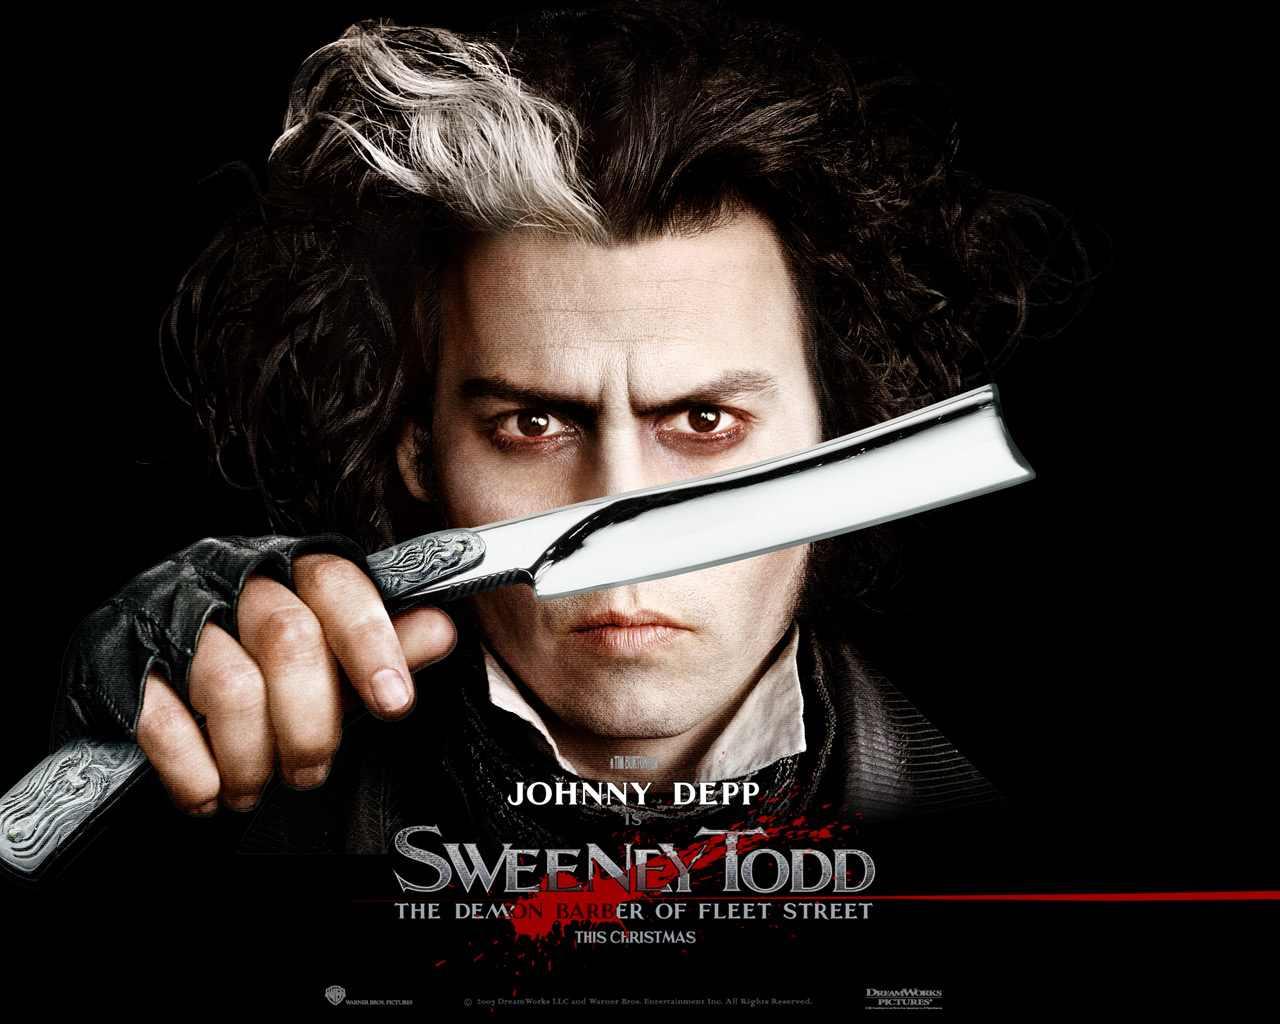 http://1.bp.blogspot.com/-XQ6JfMitmYA/TcUCHSNO61I/AAAAAAAAAsM/HWq8-ZetFuI/s1600/Johnny_Depp_in_2007_Sweeney_Todd__The_Demon_Barber_of_Fleet_Street_Wallpaper_4_1024.jpg